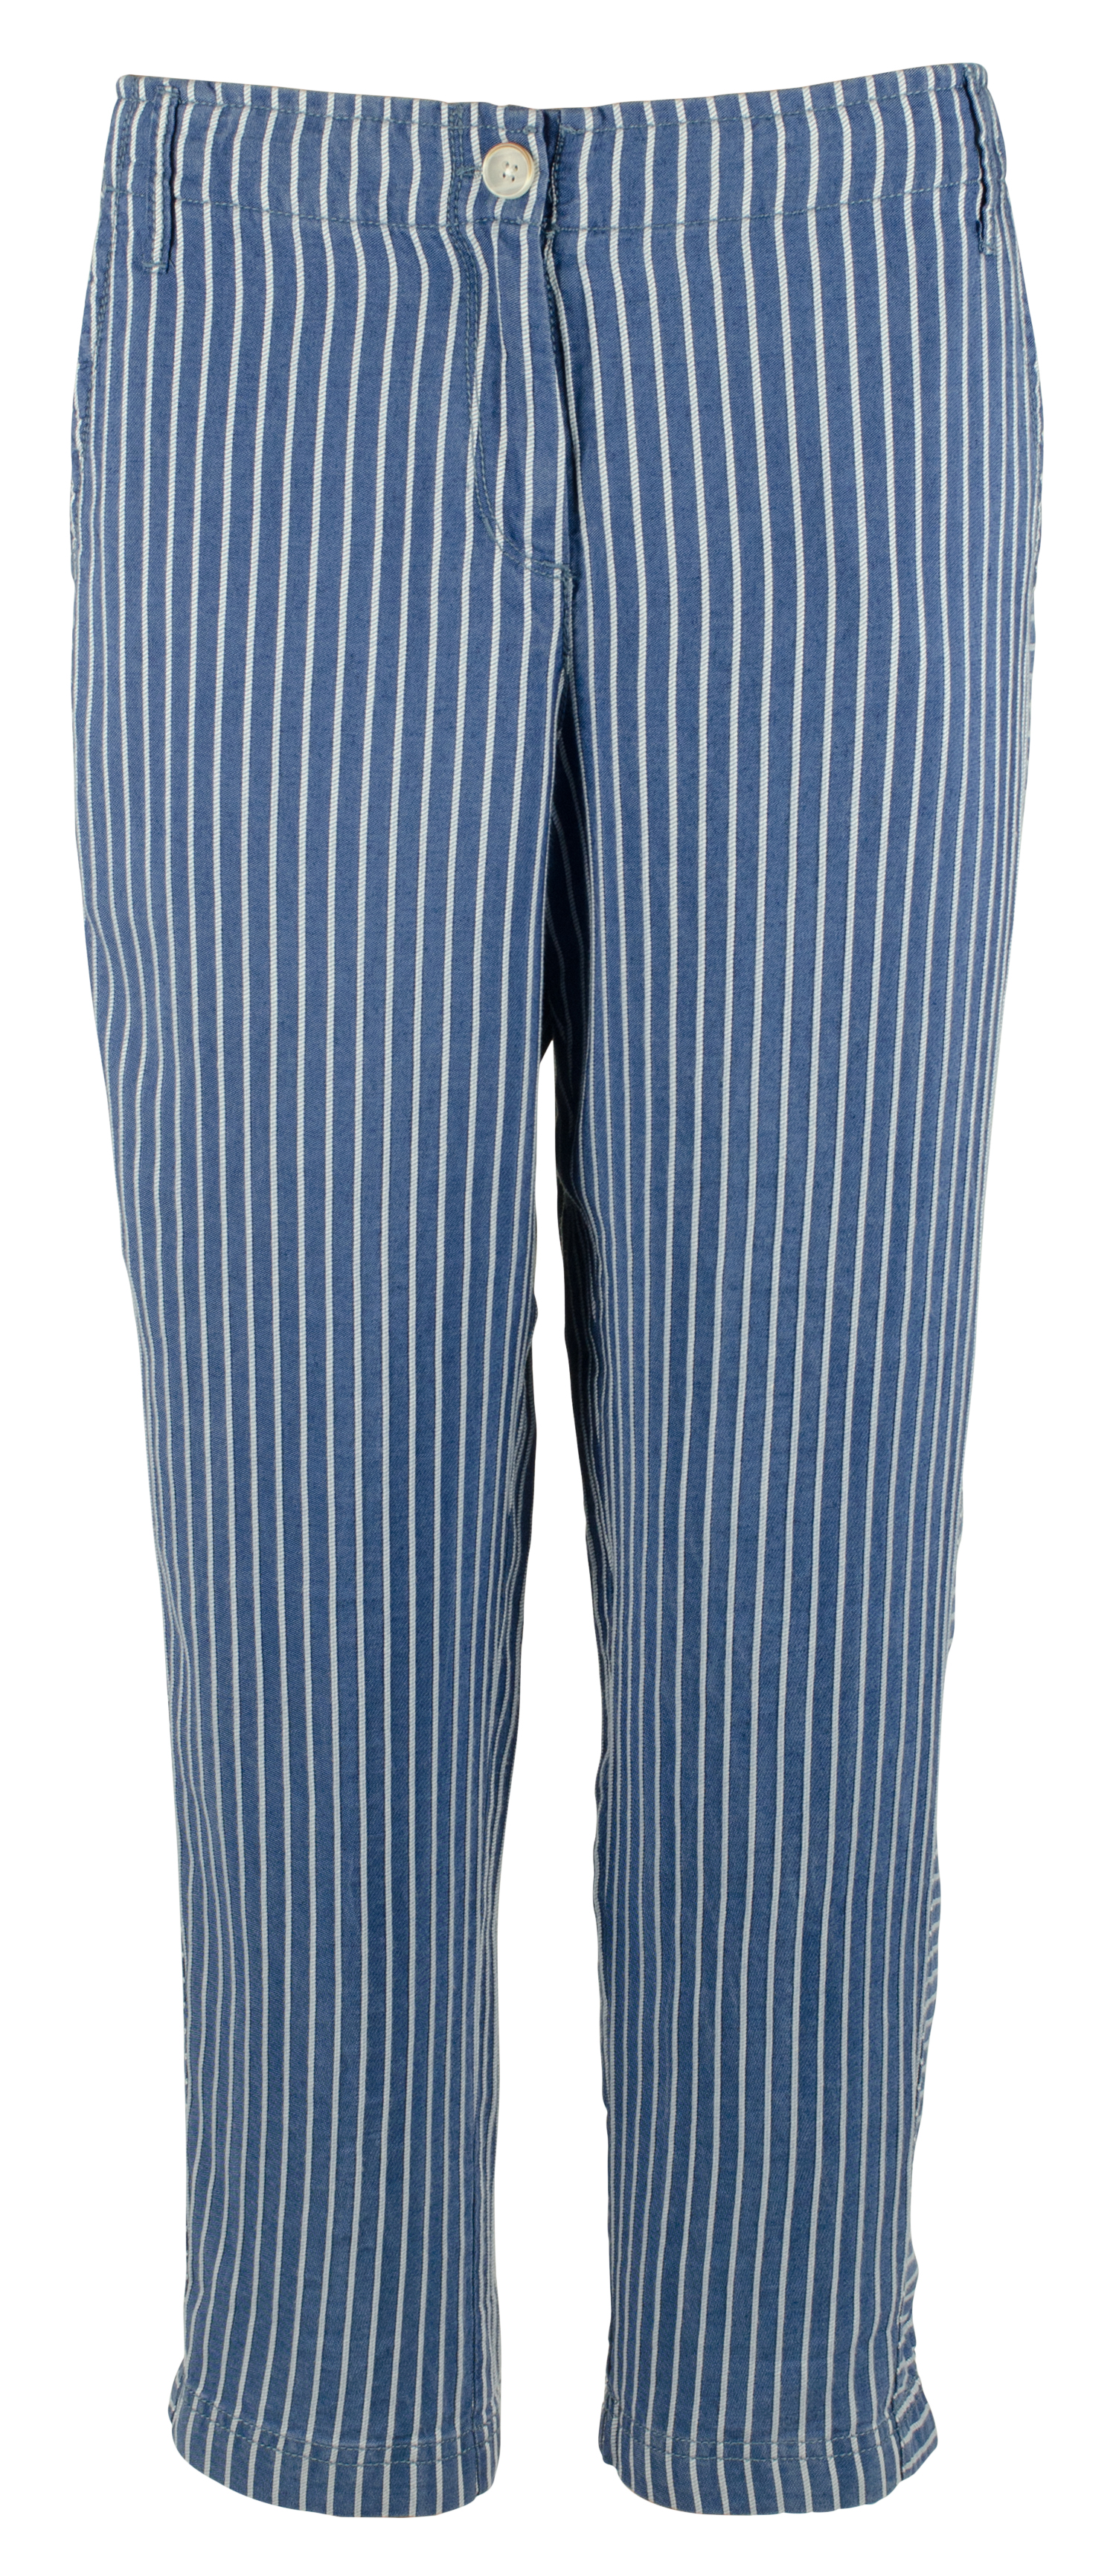 Style /& Co Womens Navy Comfort Waist Cropped Capri Pants Plus 24W BHFO 4734